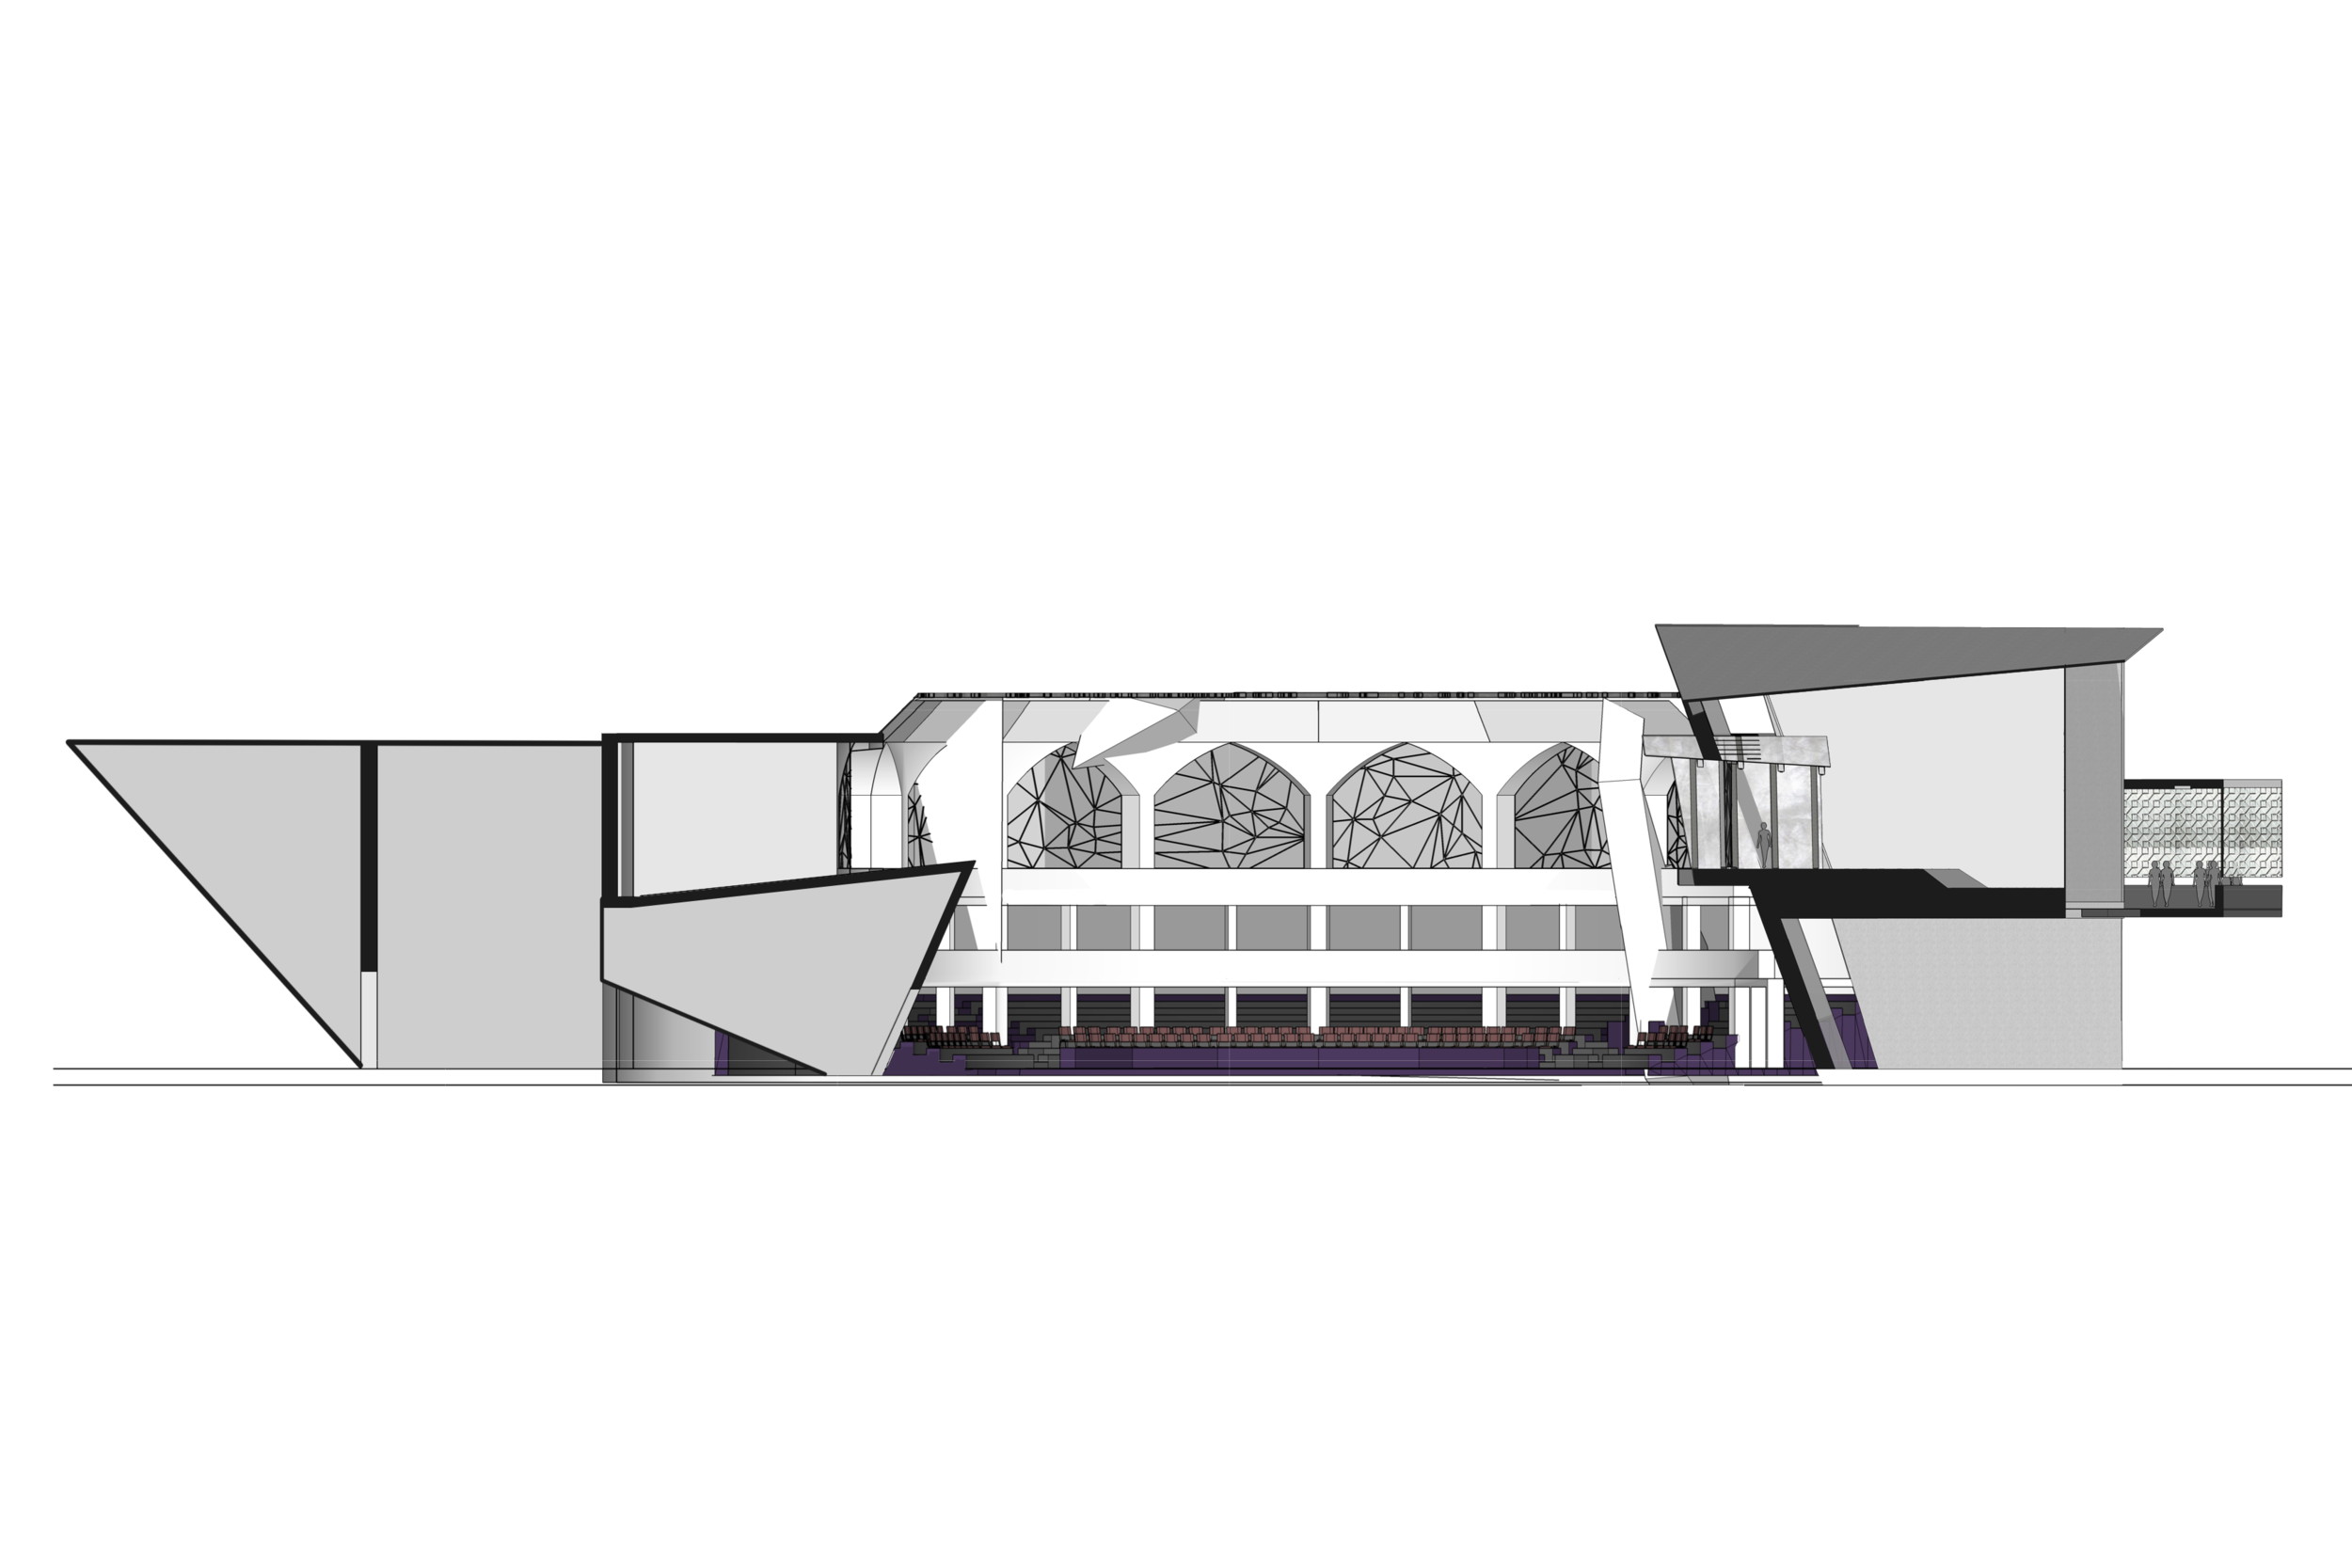 den stage cut through showcase_5.png